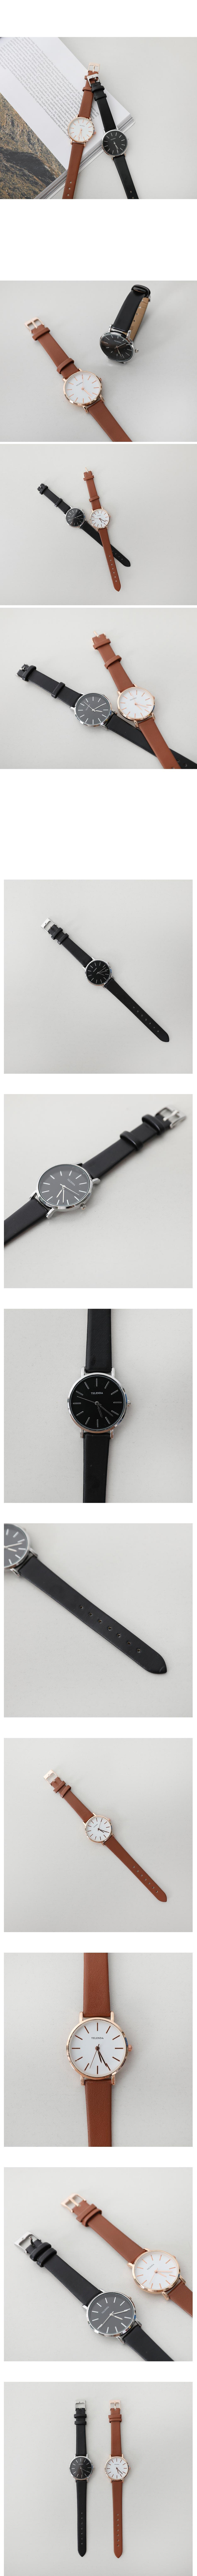 Simple Ruddy Frame Watch